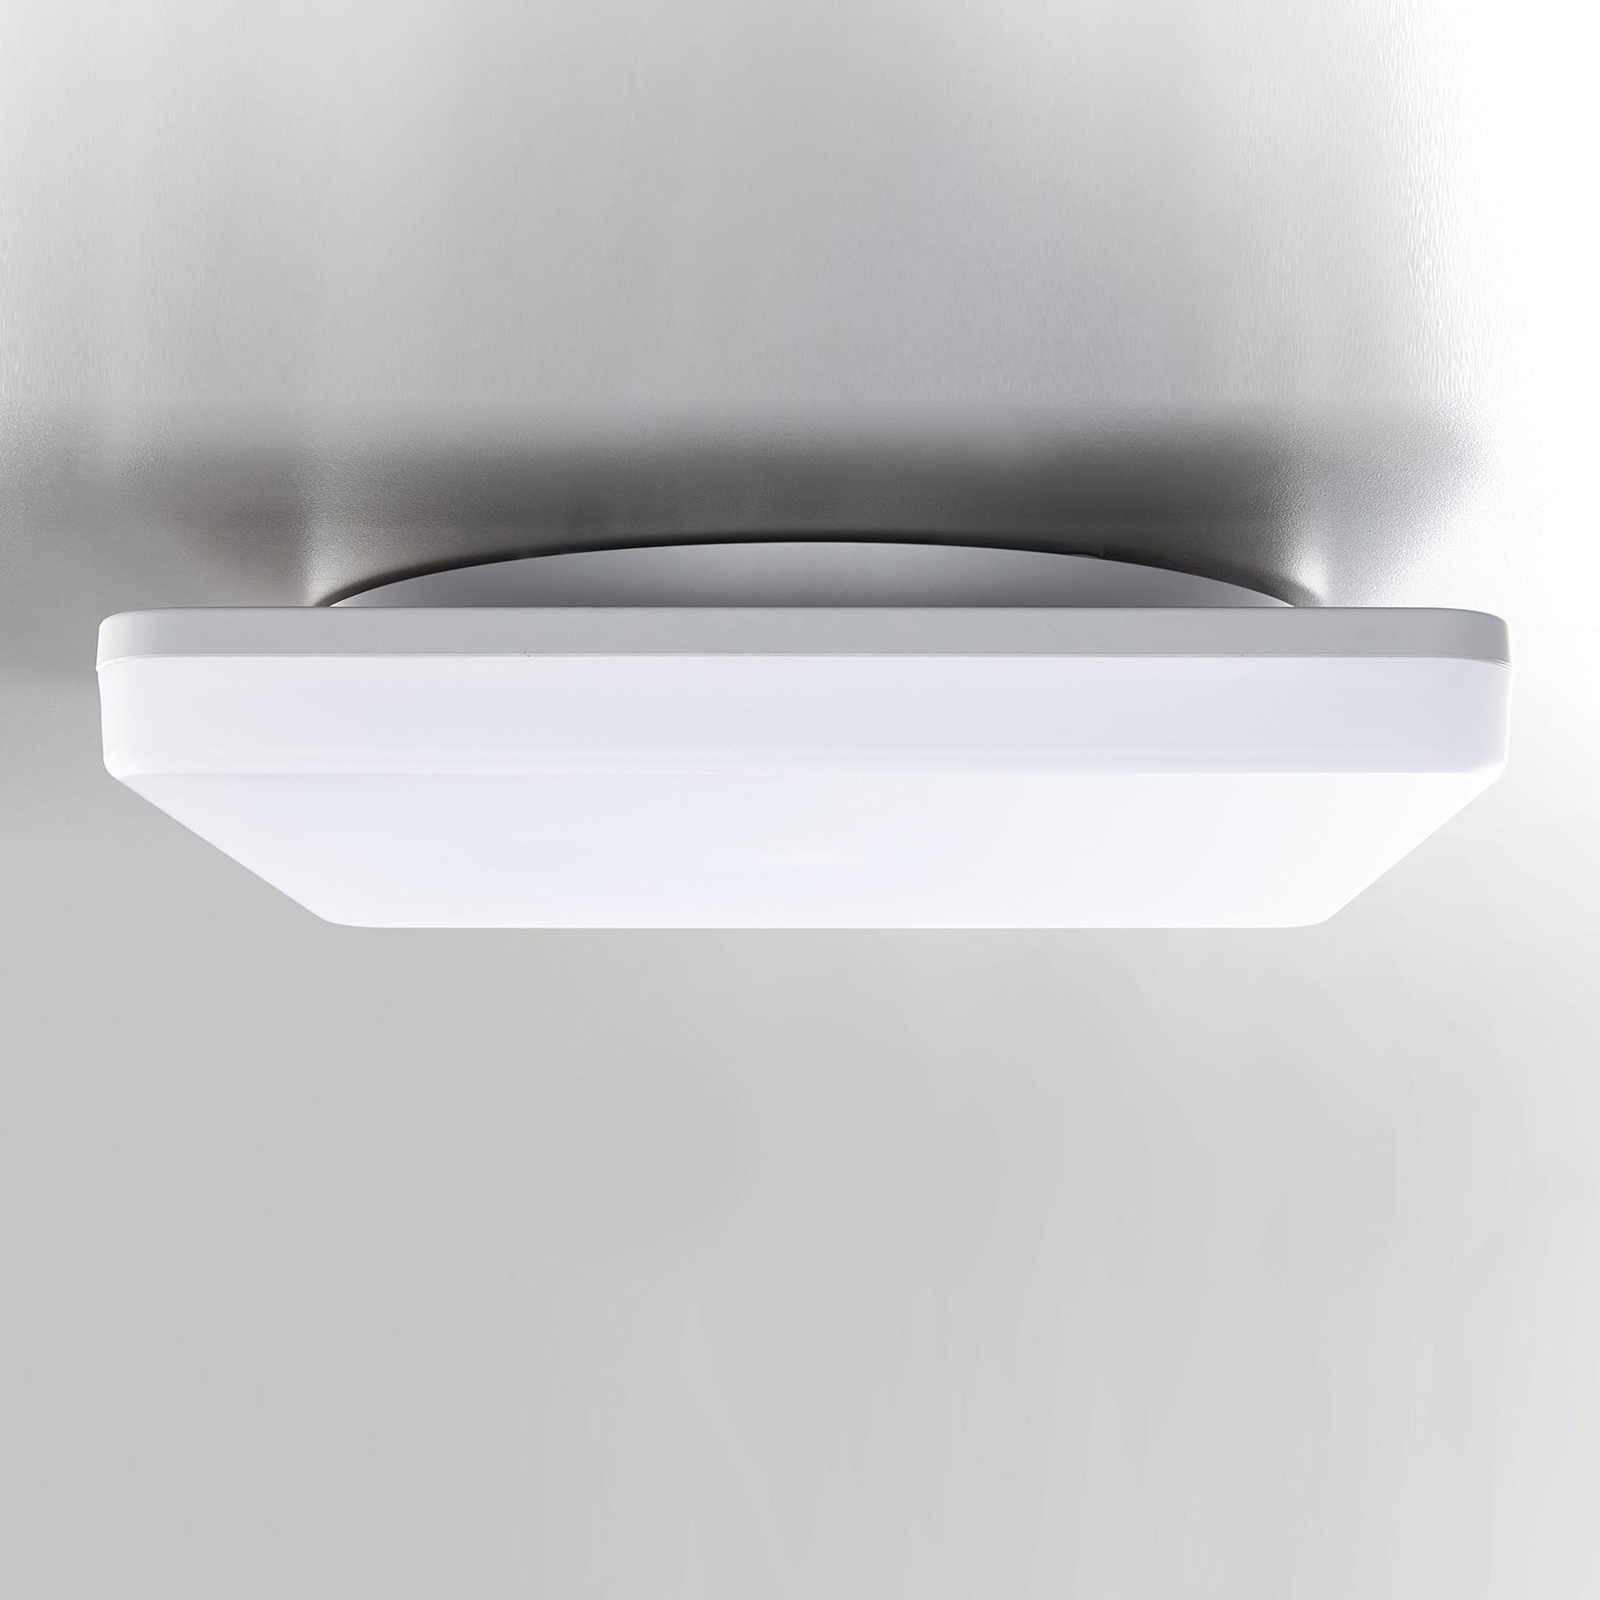 LED-kattovalaisin Pronto 33 x 33 cm